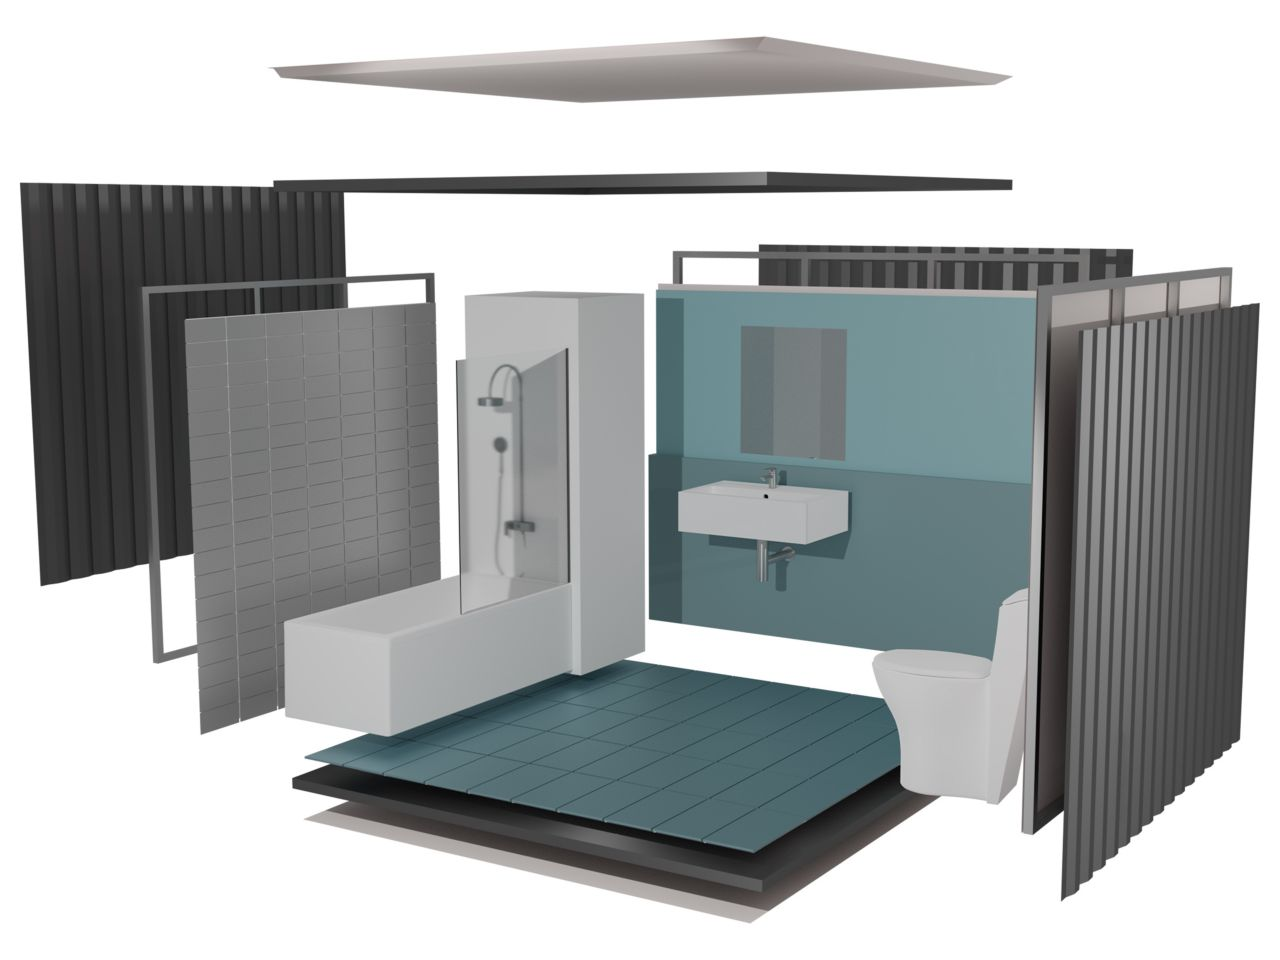 Illustration of bathroom pod